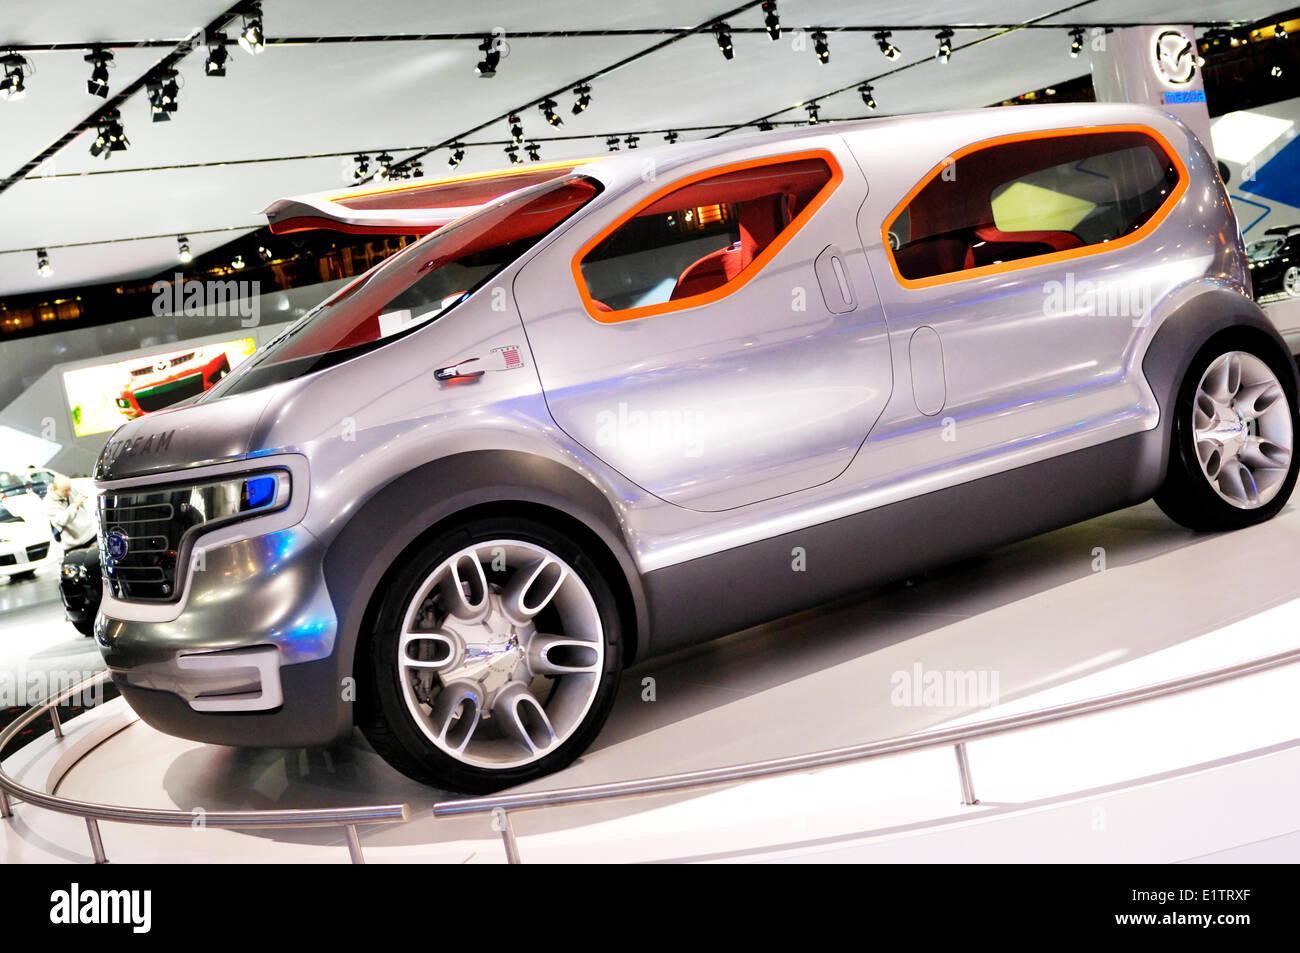 Ford Airstream crossover concept futurista powered by HySeries Drive plug-in híbrido de células de combustible Imagen De Stock